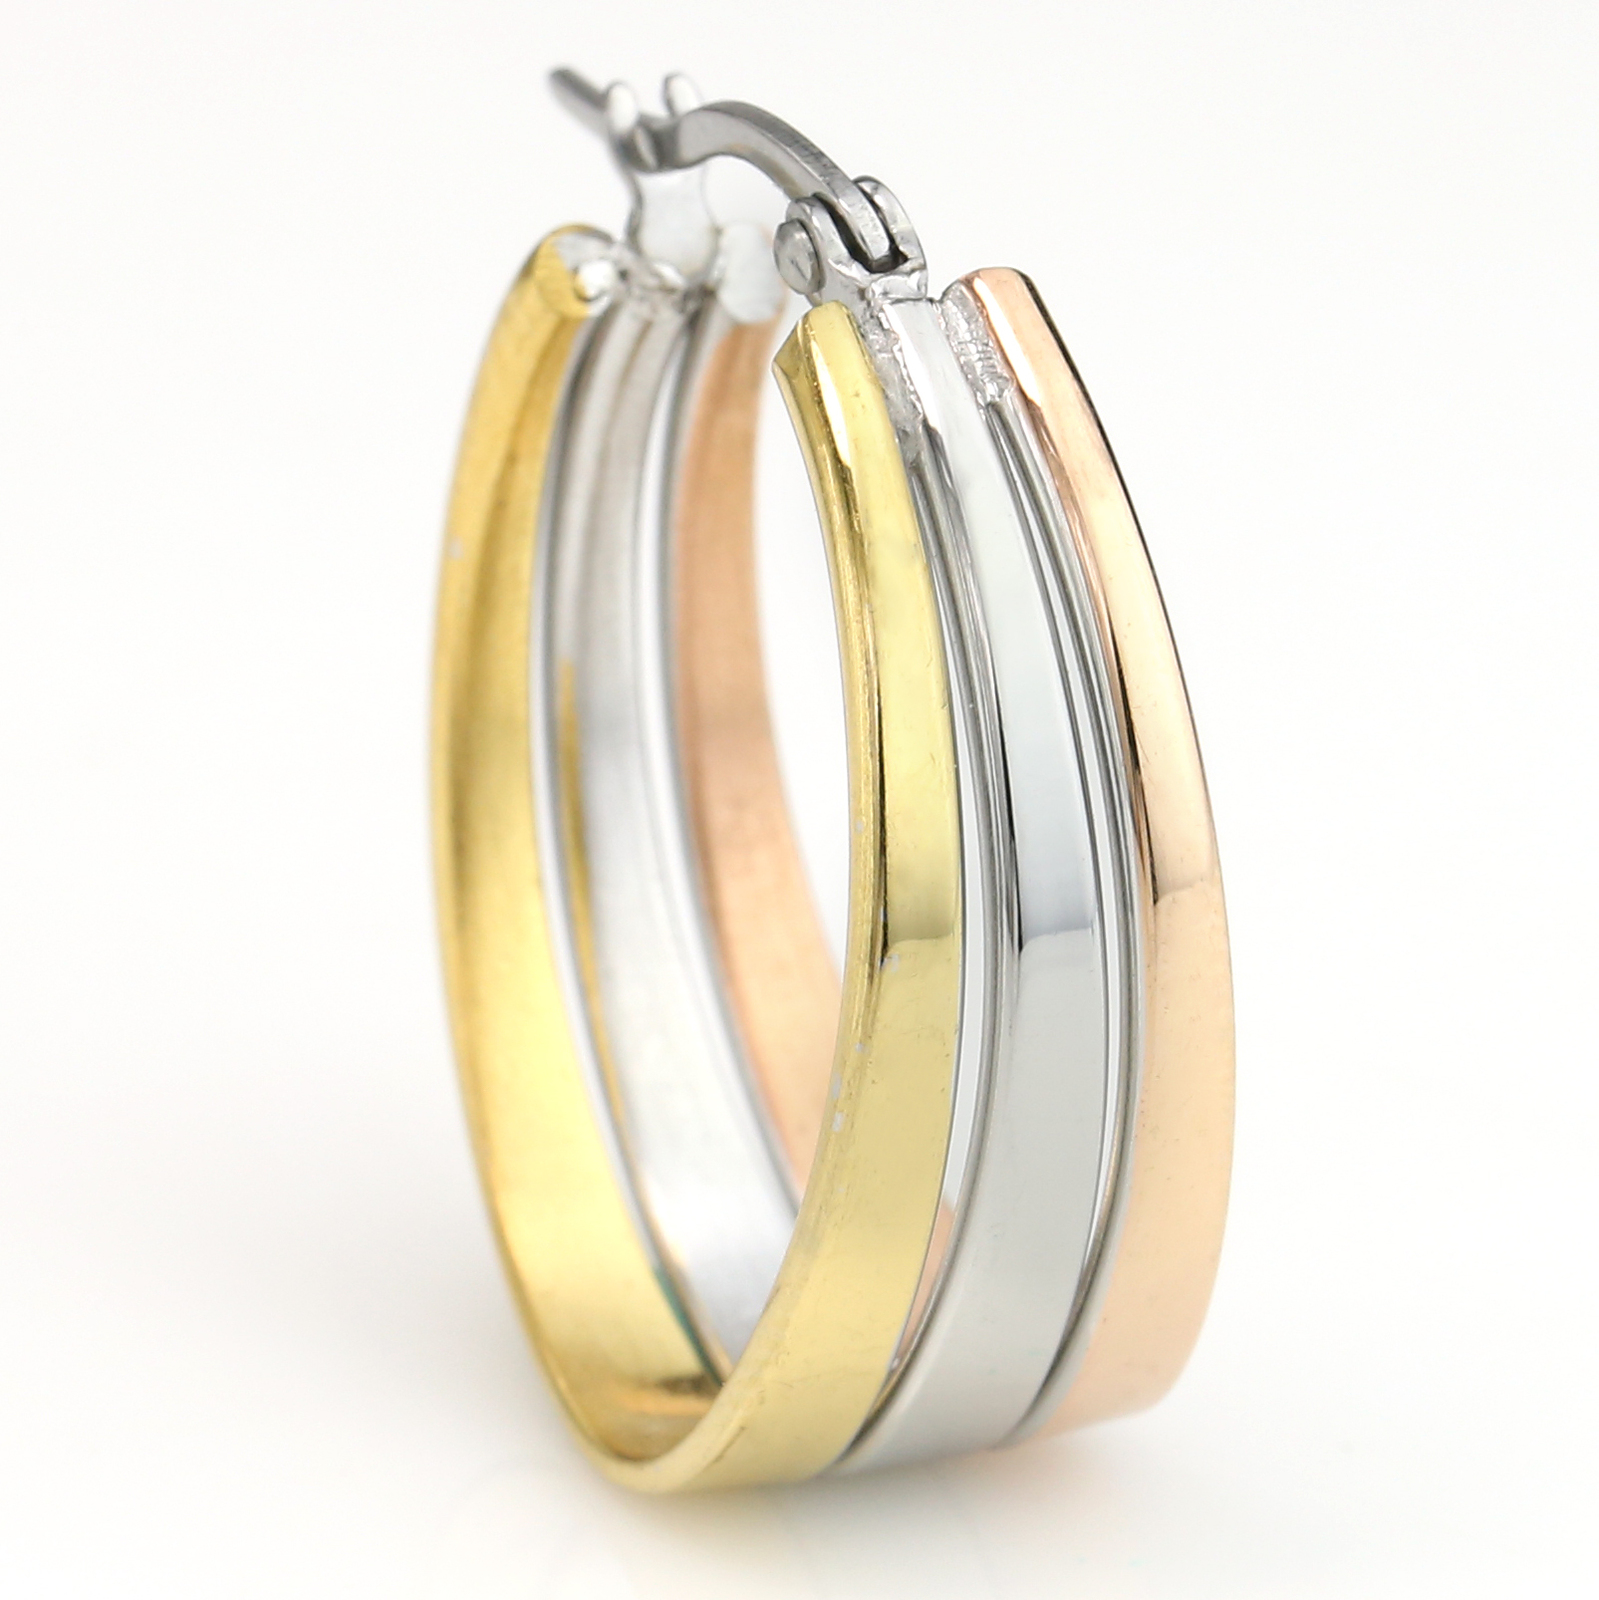 Polished Oval Tri-Color Silver, Gold & Rose Tone Hoop Earrings- United Elegance